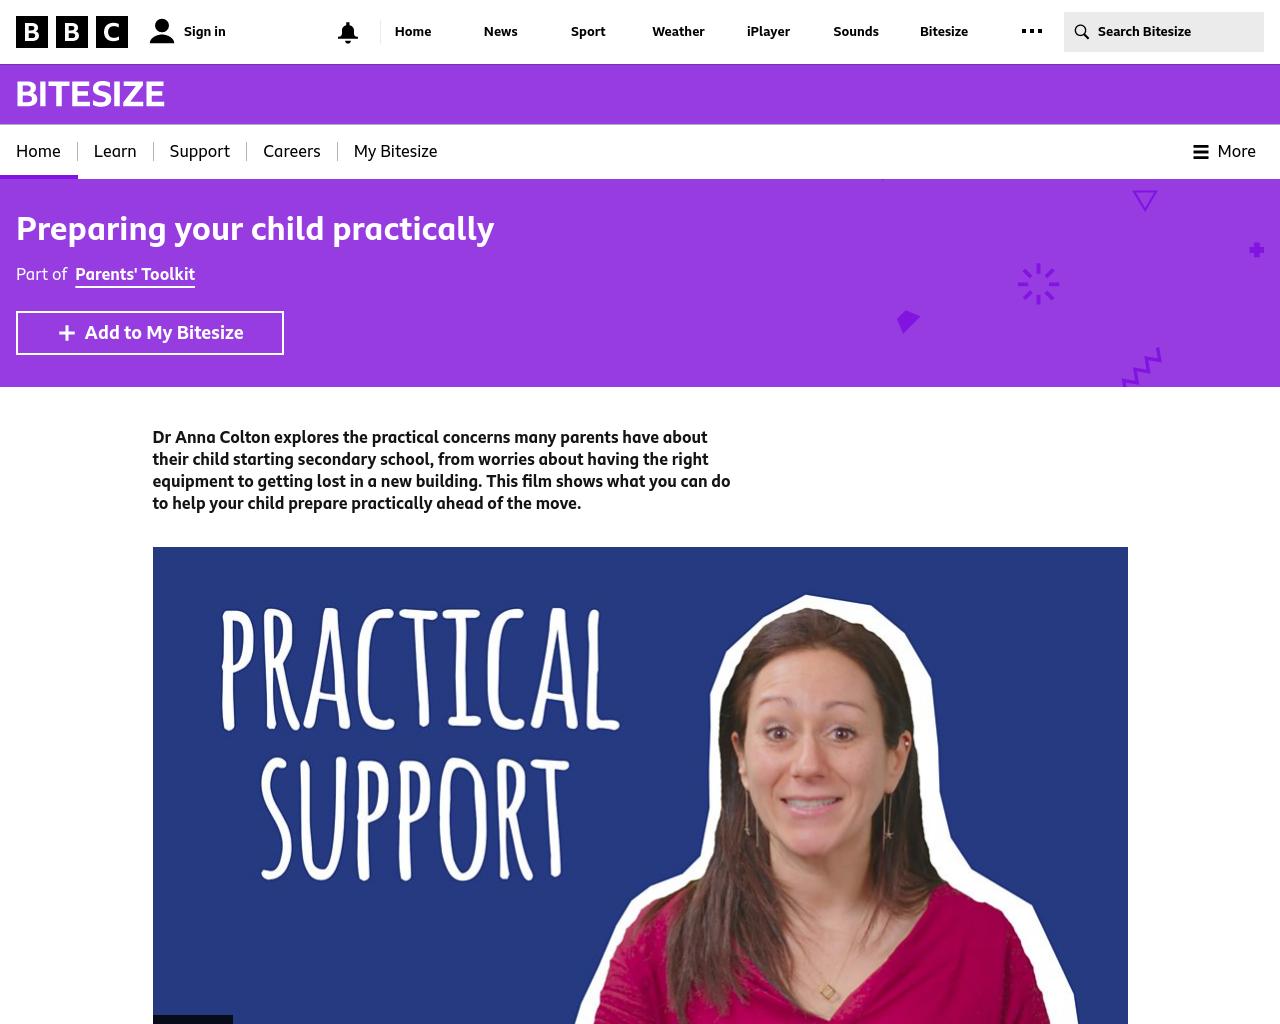 Preparing your child practically